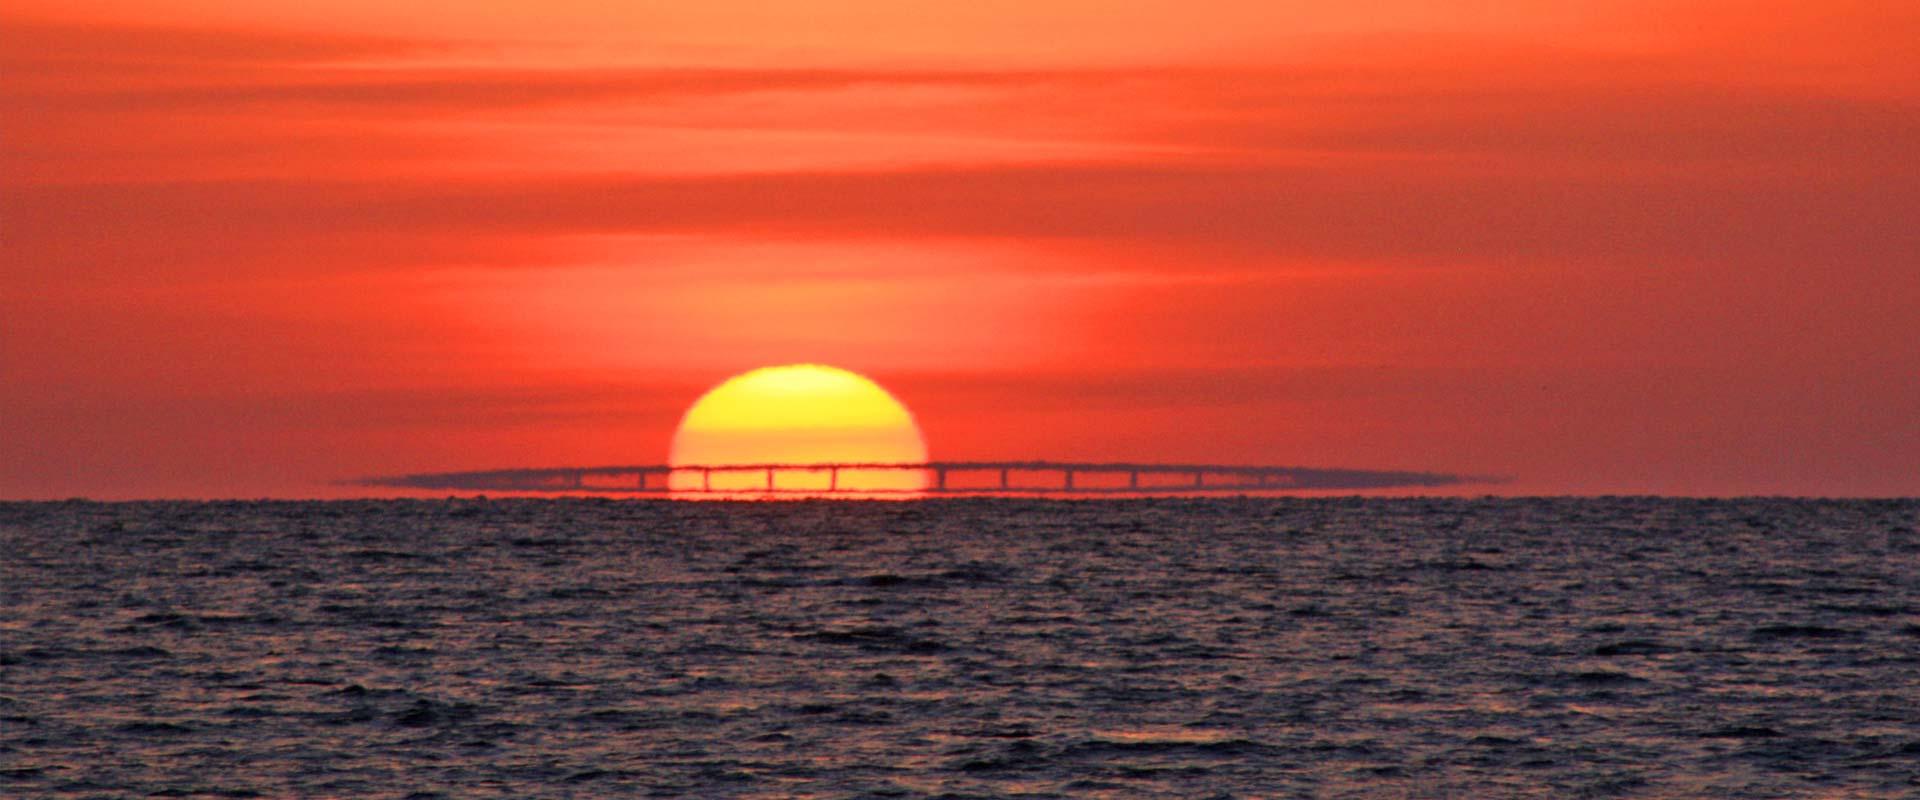 Sunset Image #1